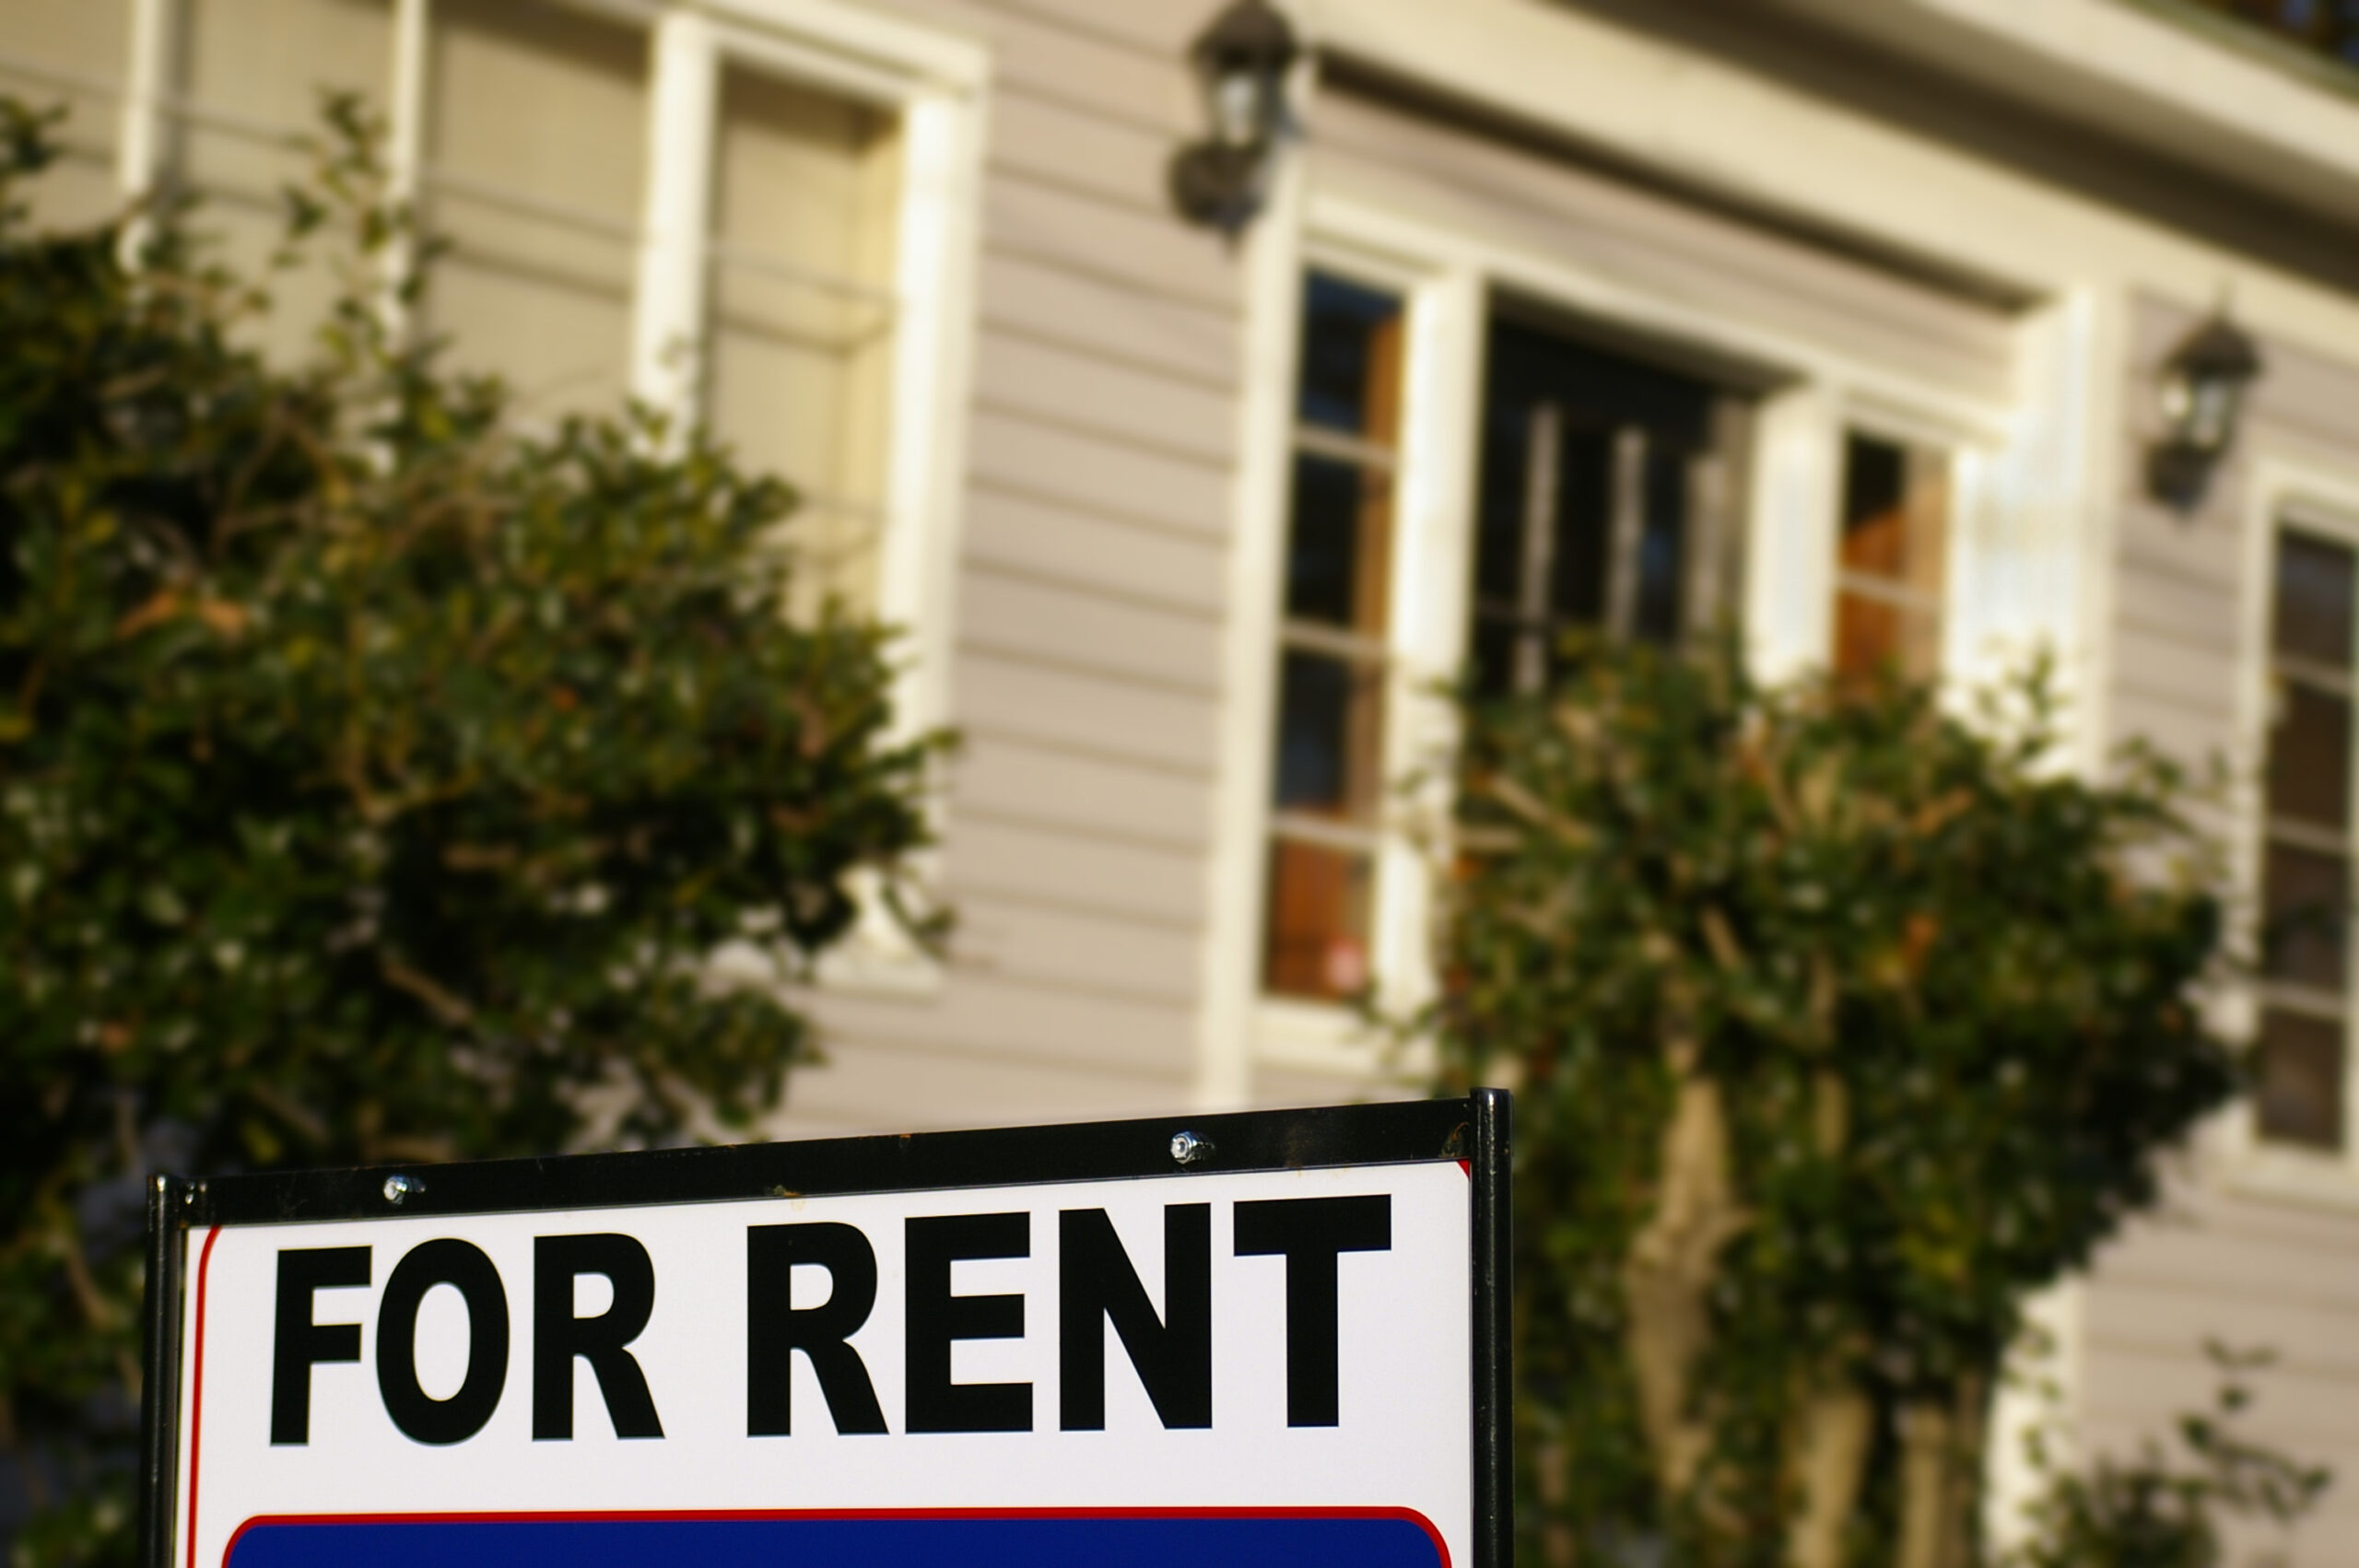 Provinces Temporarily Ban Short Term Rentals